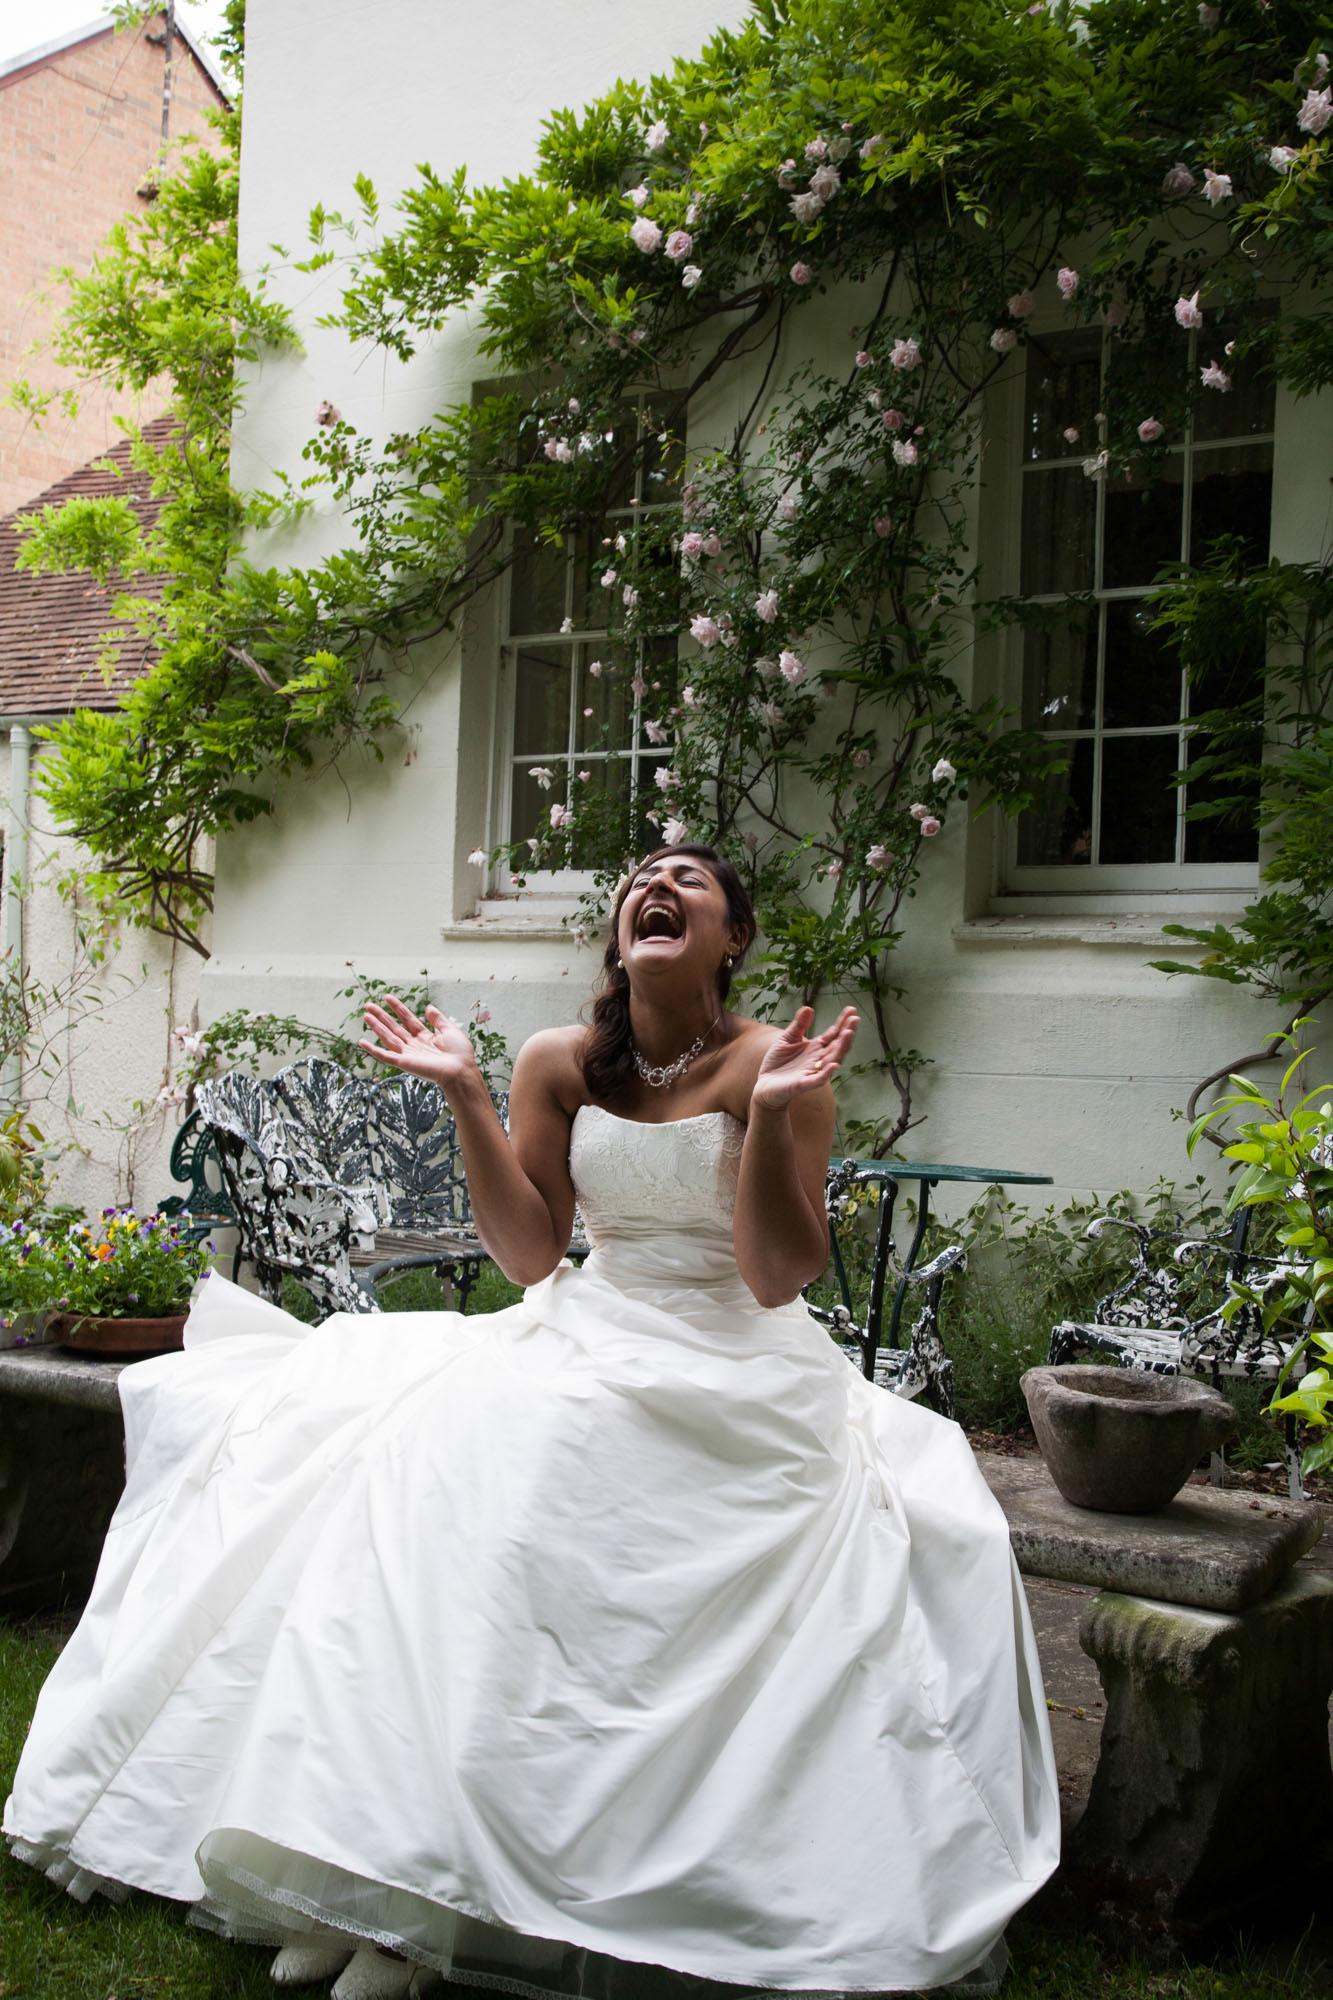 weddings-couples-love-photographer-oxford-london-jonathan-self-photography-83.jpg